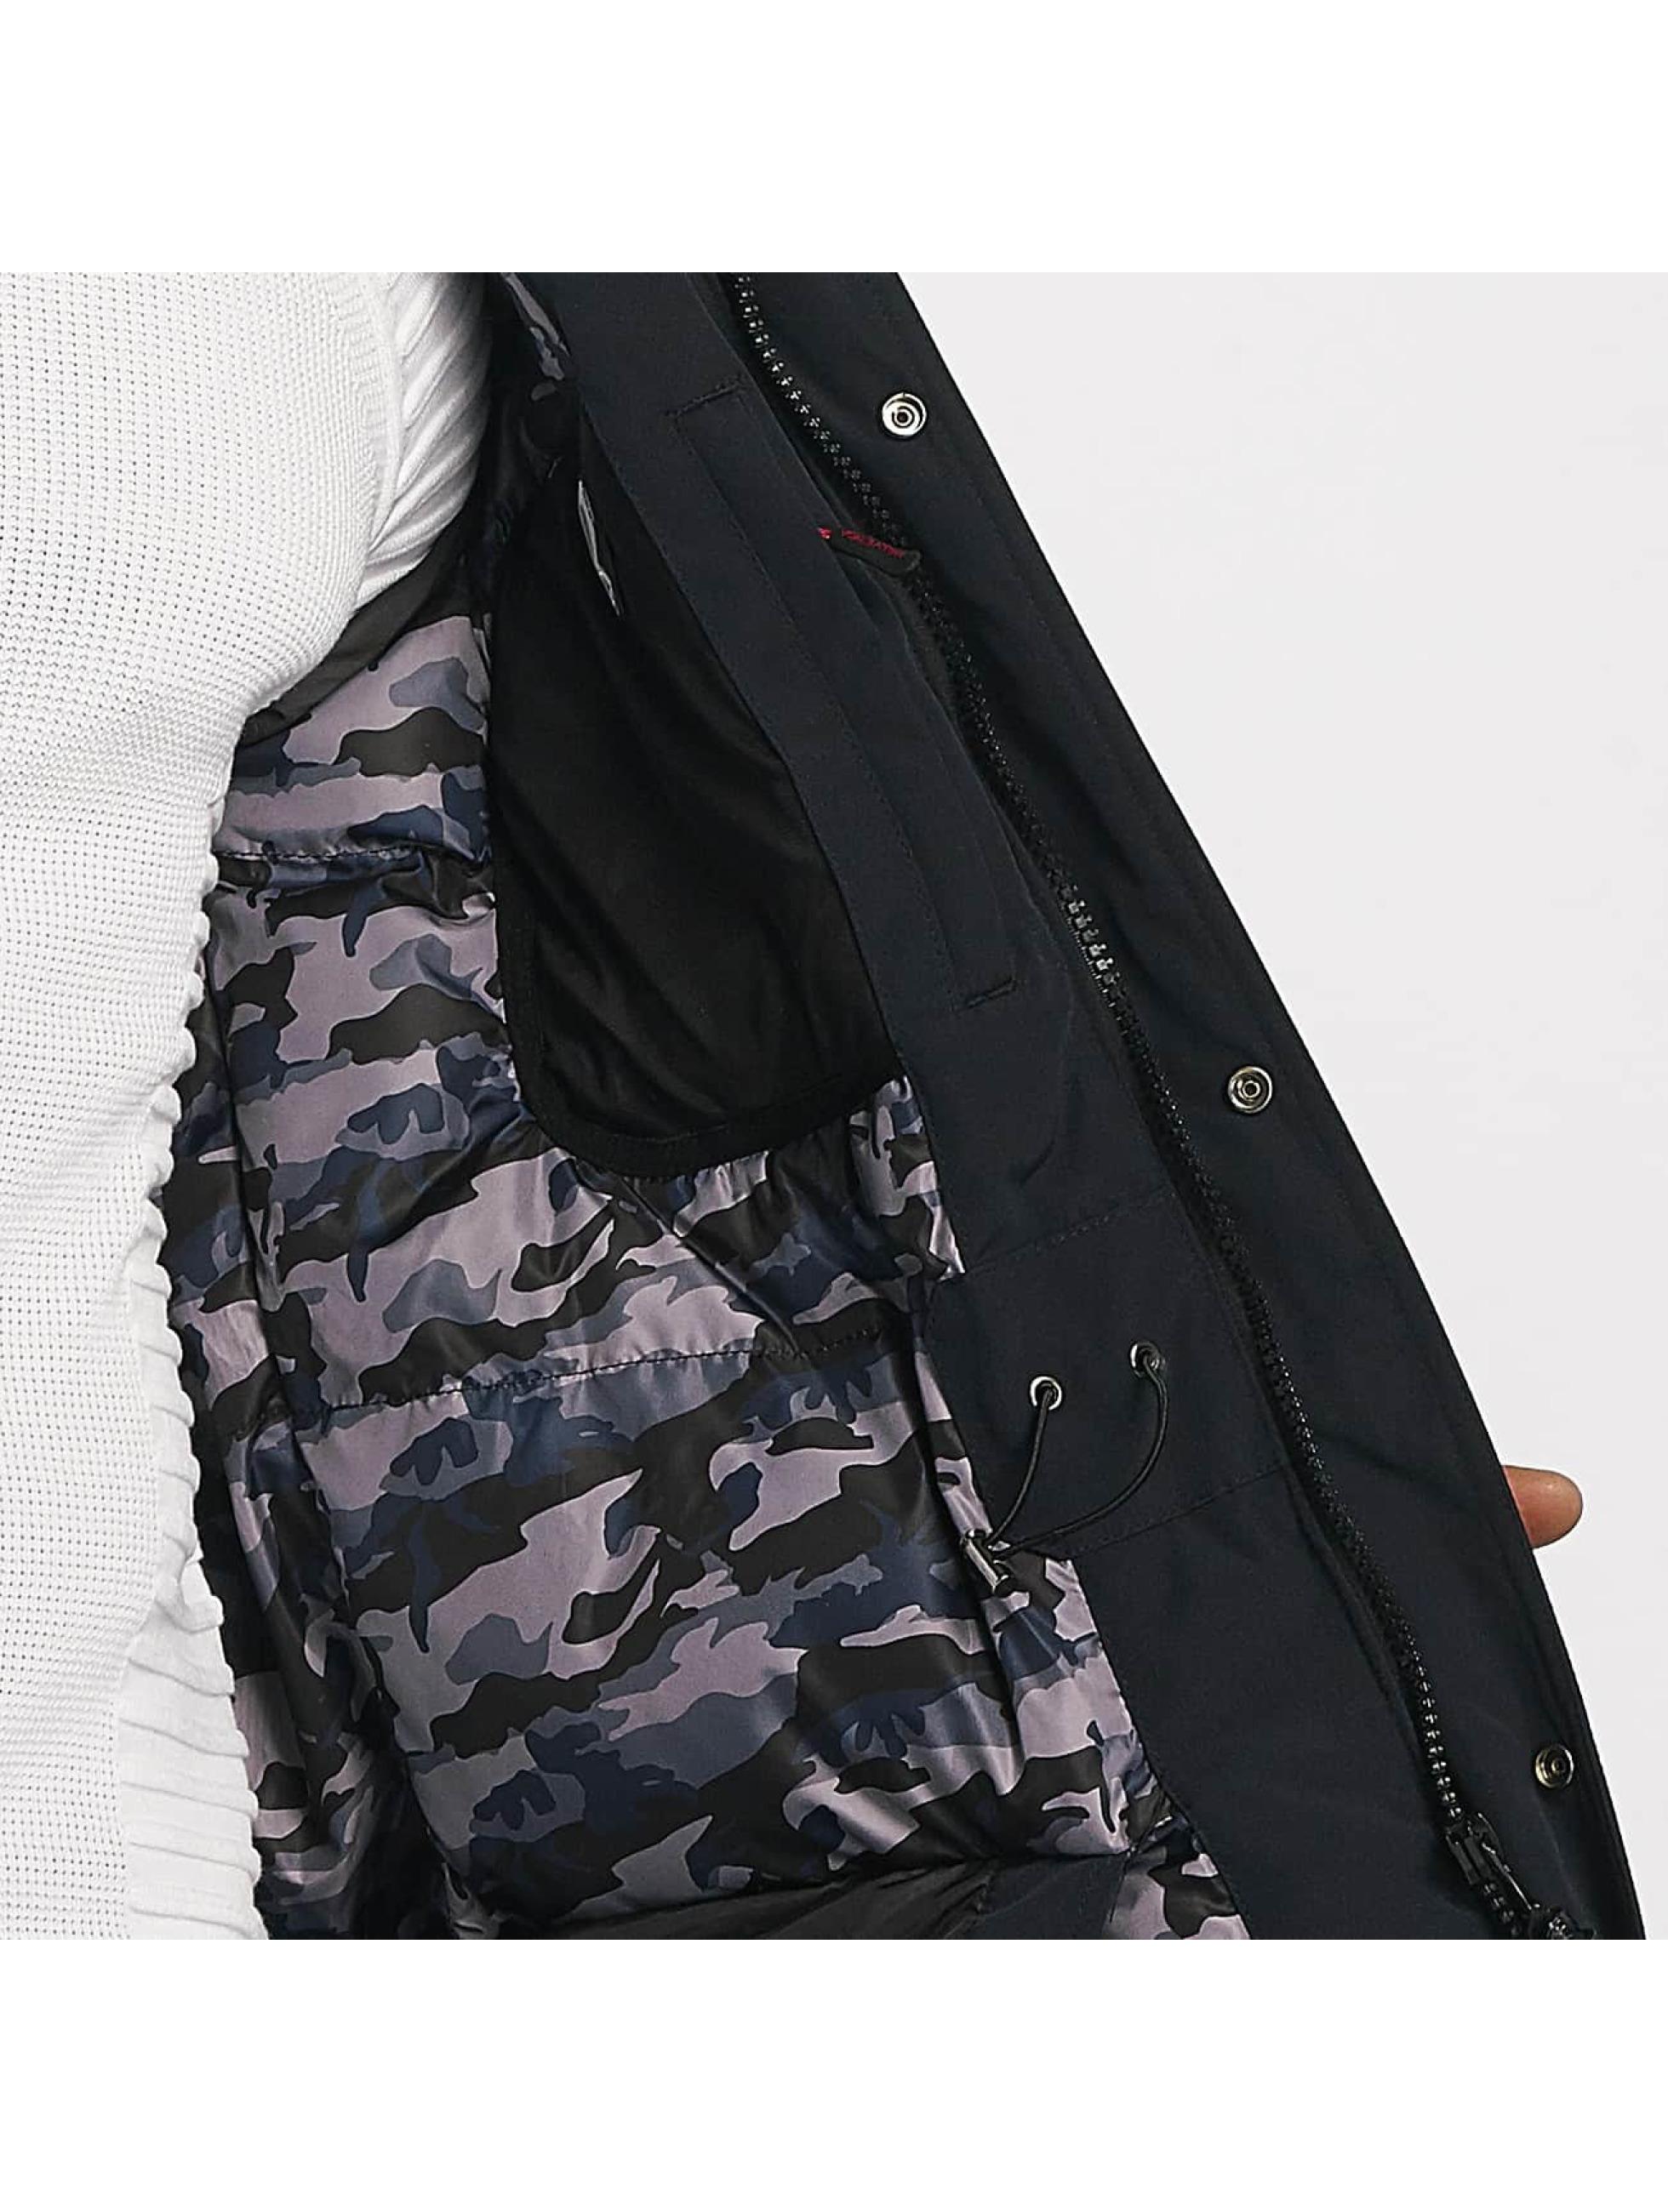 Helvetica Manteau hiver Expedition Black Edition bleu